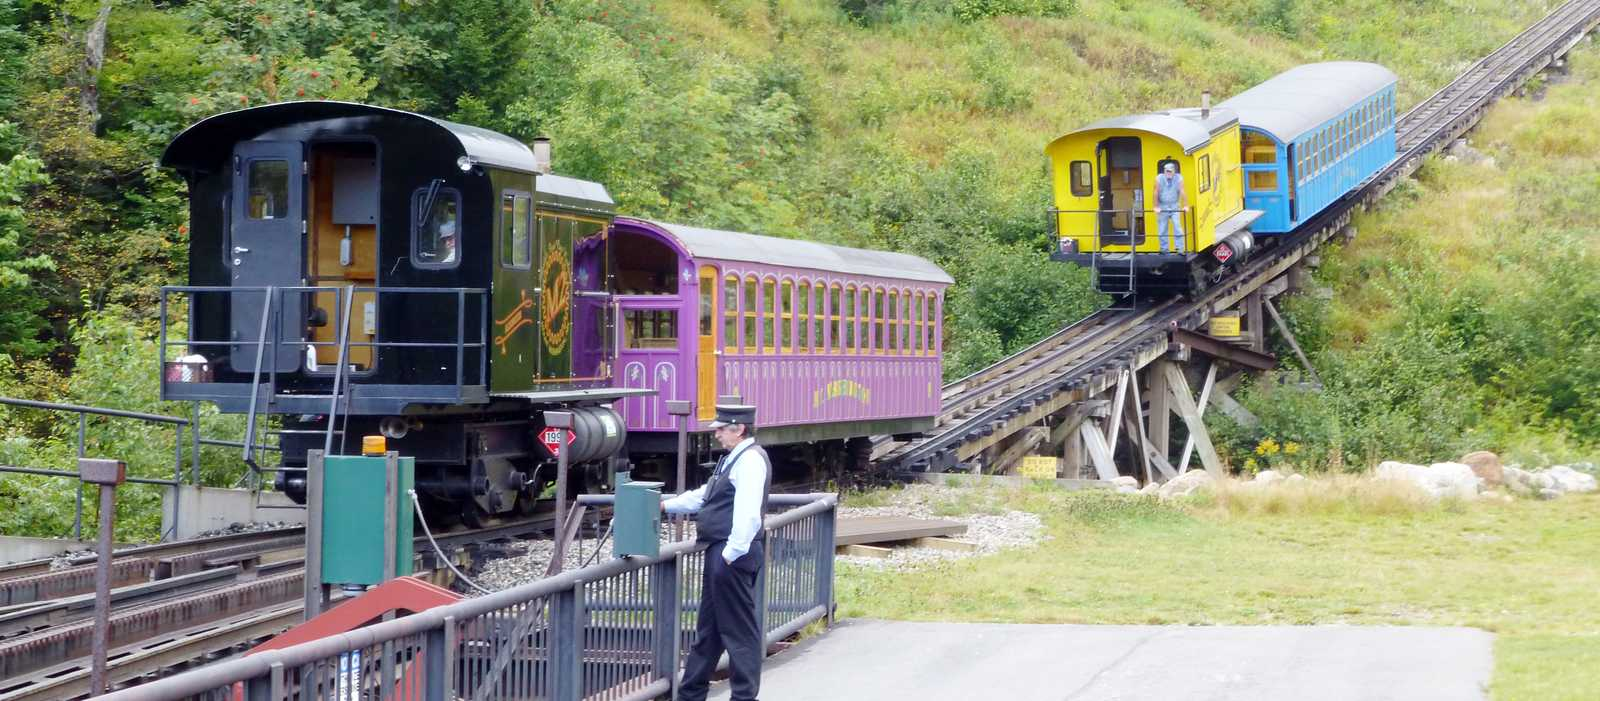 The Cog Railway